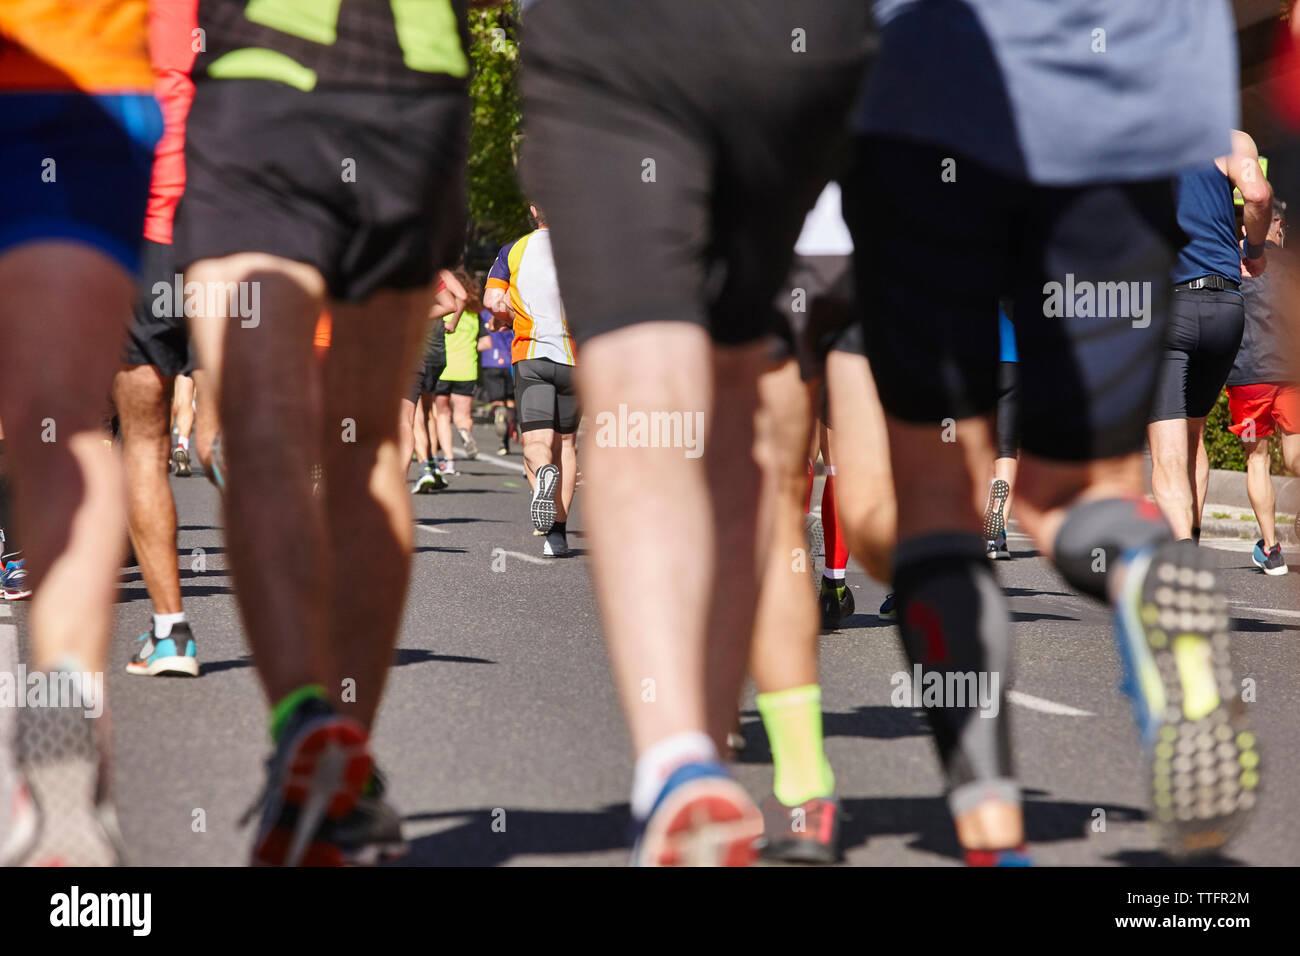 Marathon runners on the street. Healthy lifestyle. Athletes endurance - Stock Image